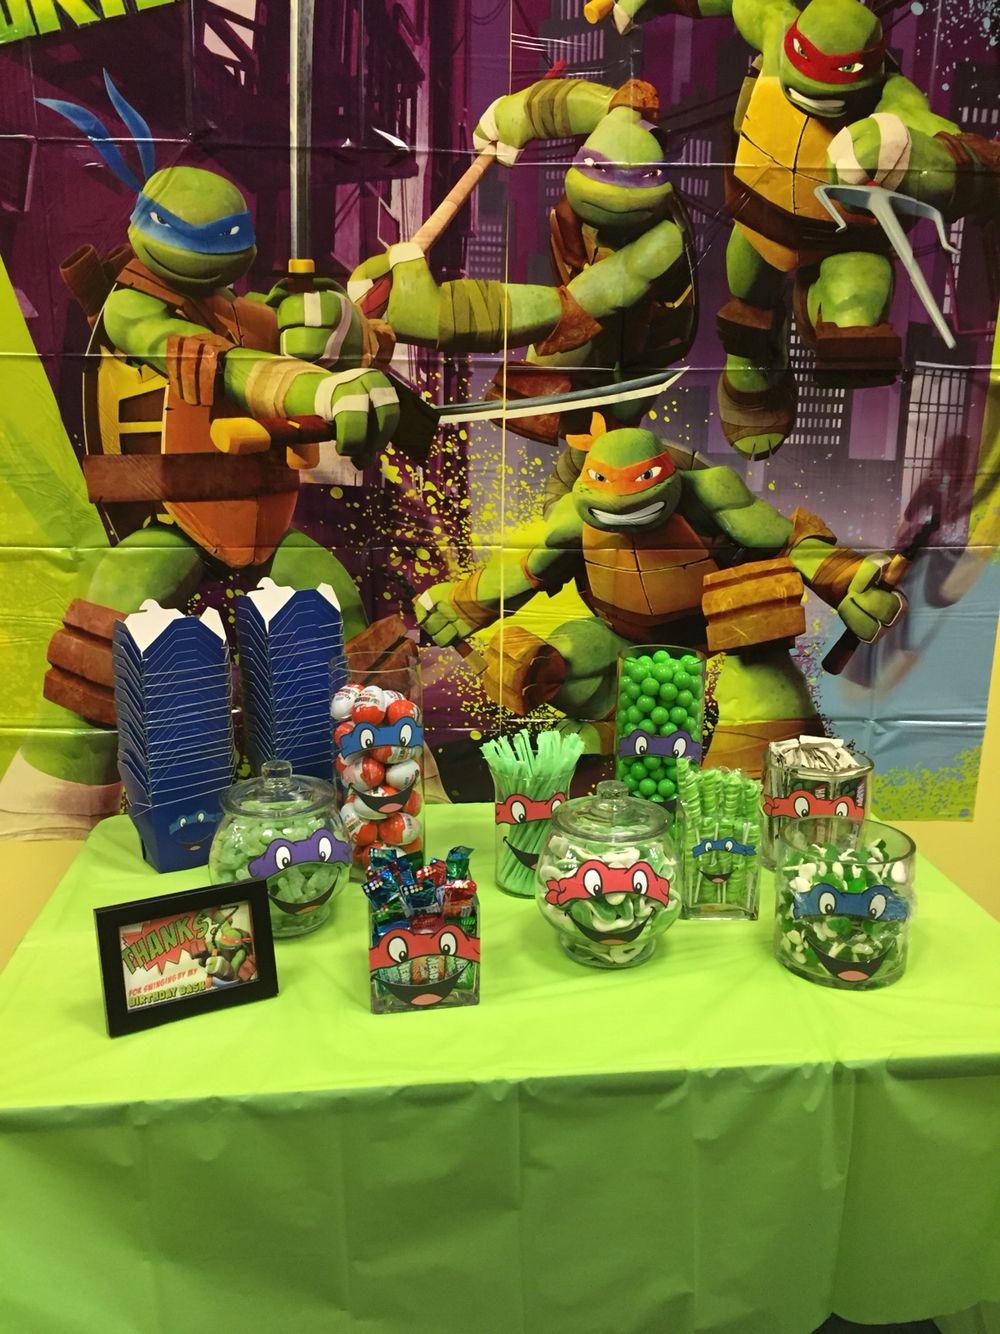 Tmnt Candy Bar Ninja Turtles Birthday Party Tmnt Birthday Party Ideas Teenage Mutant Ninja Turtles Birthday Party